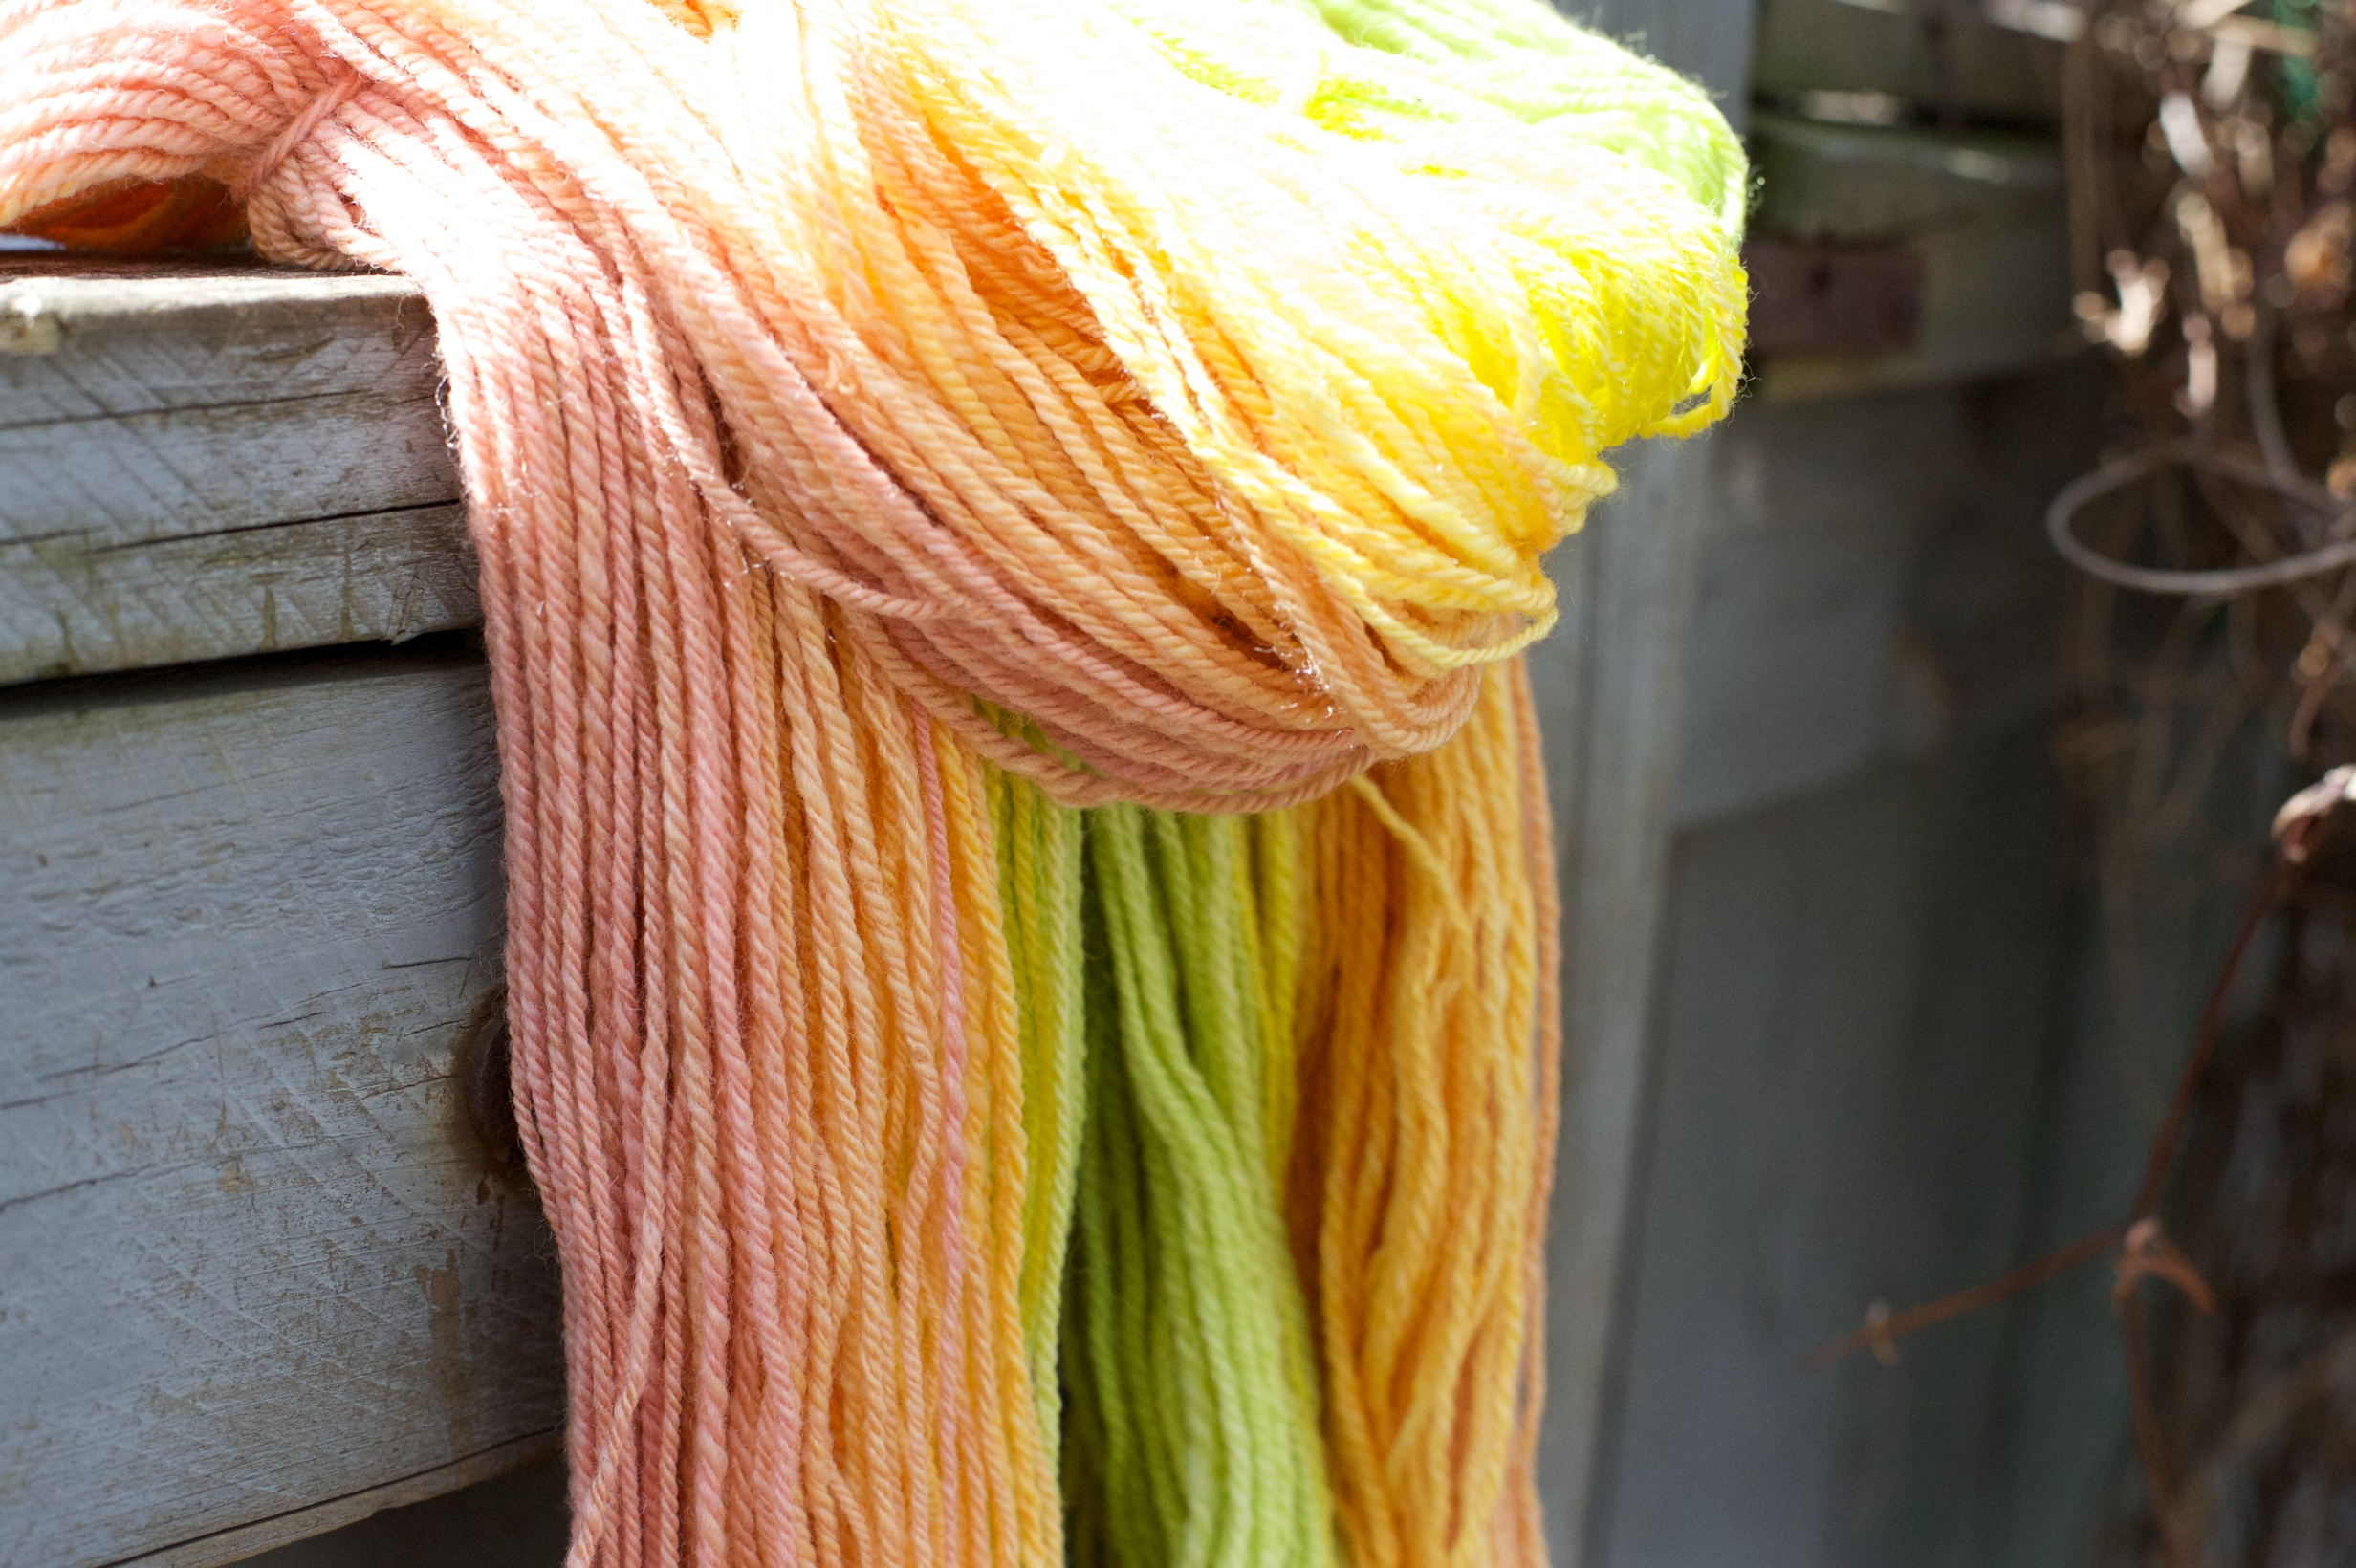 pastelstripedyarn 2014-05-06